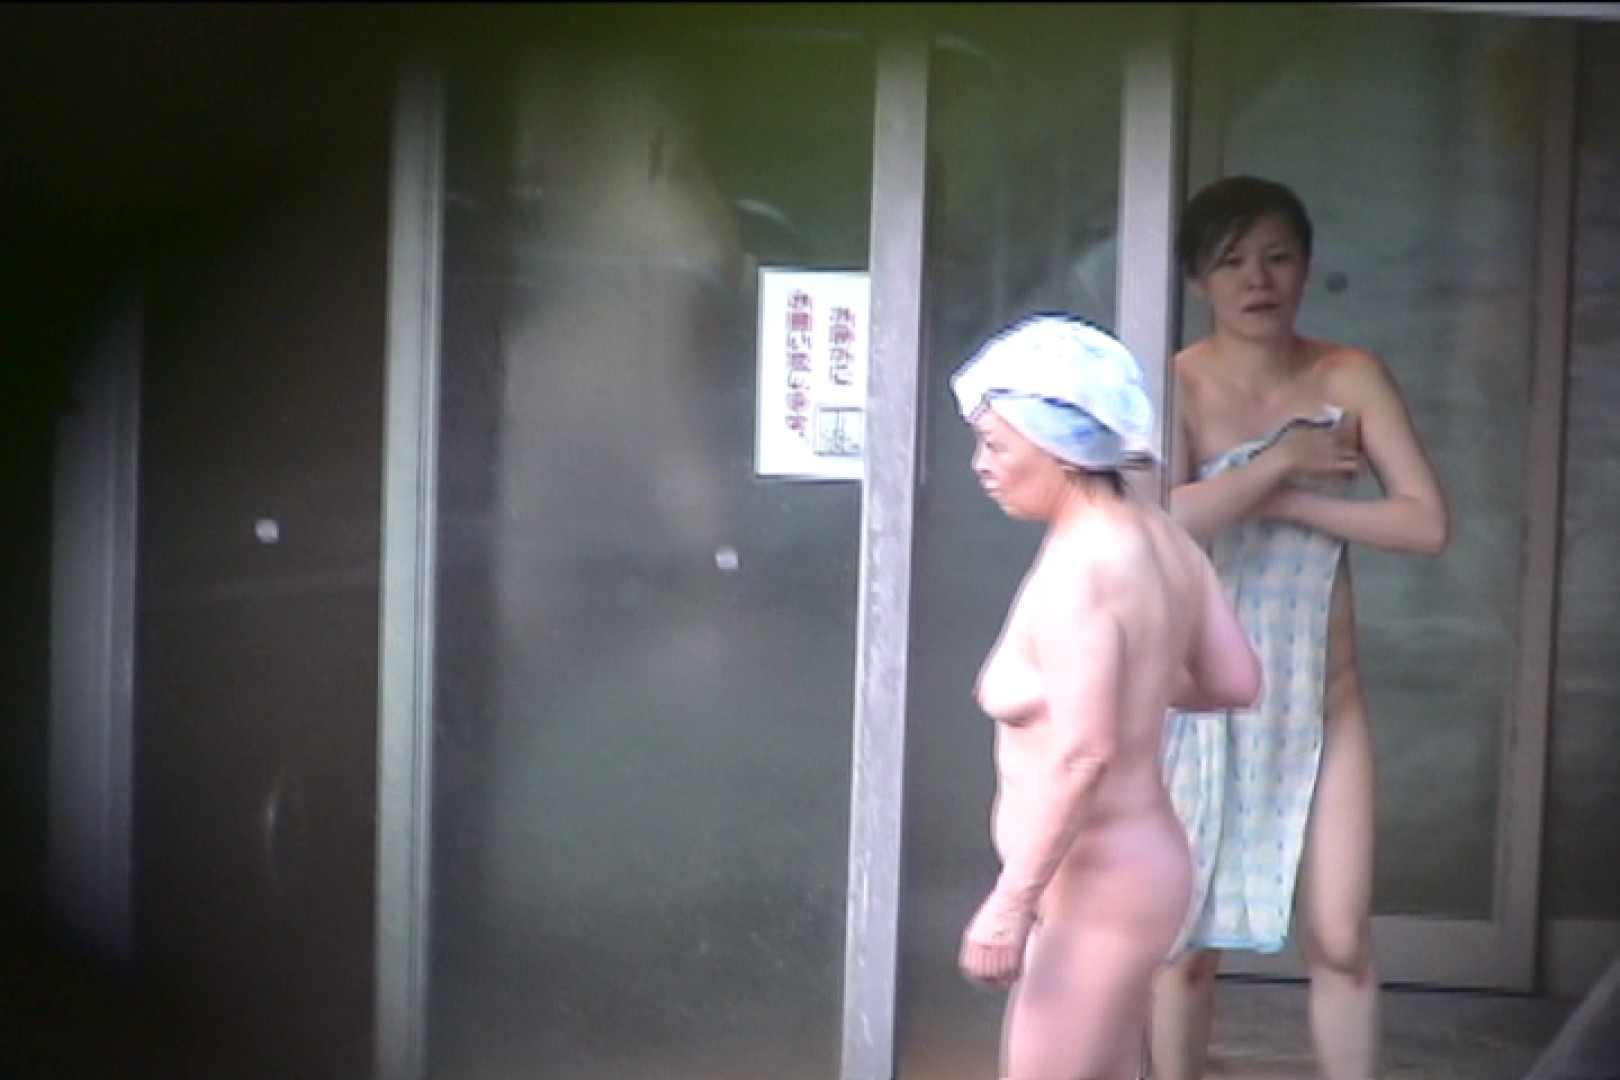 Aquaな露天風呂Vol.450 盗撮映像  55Pix 11